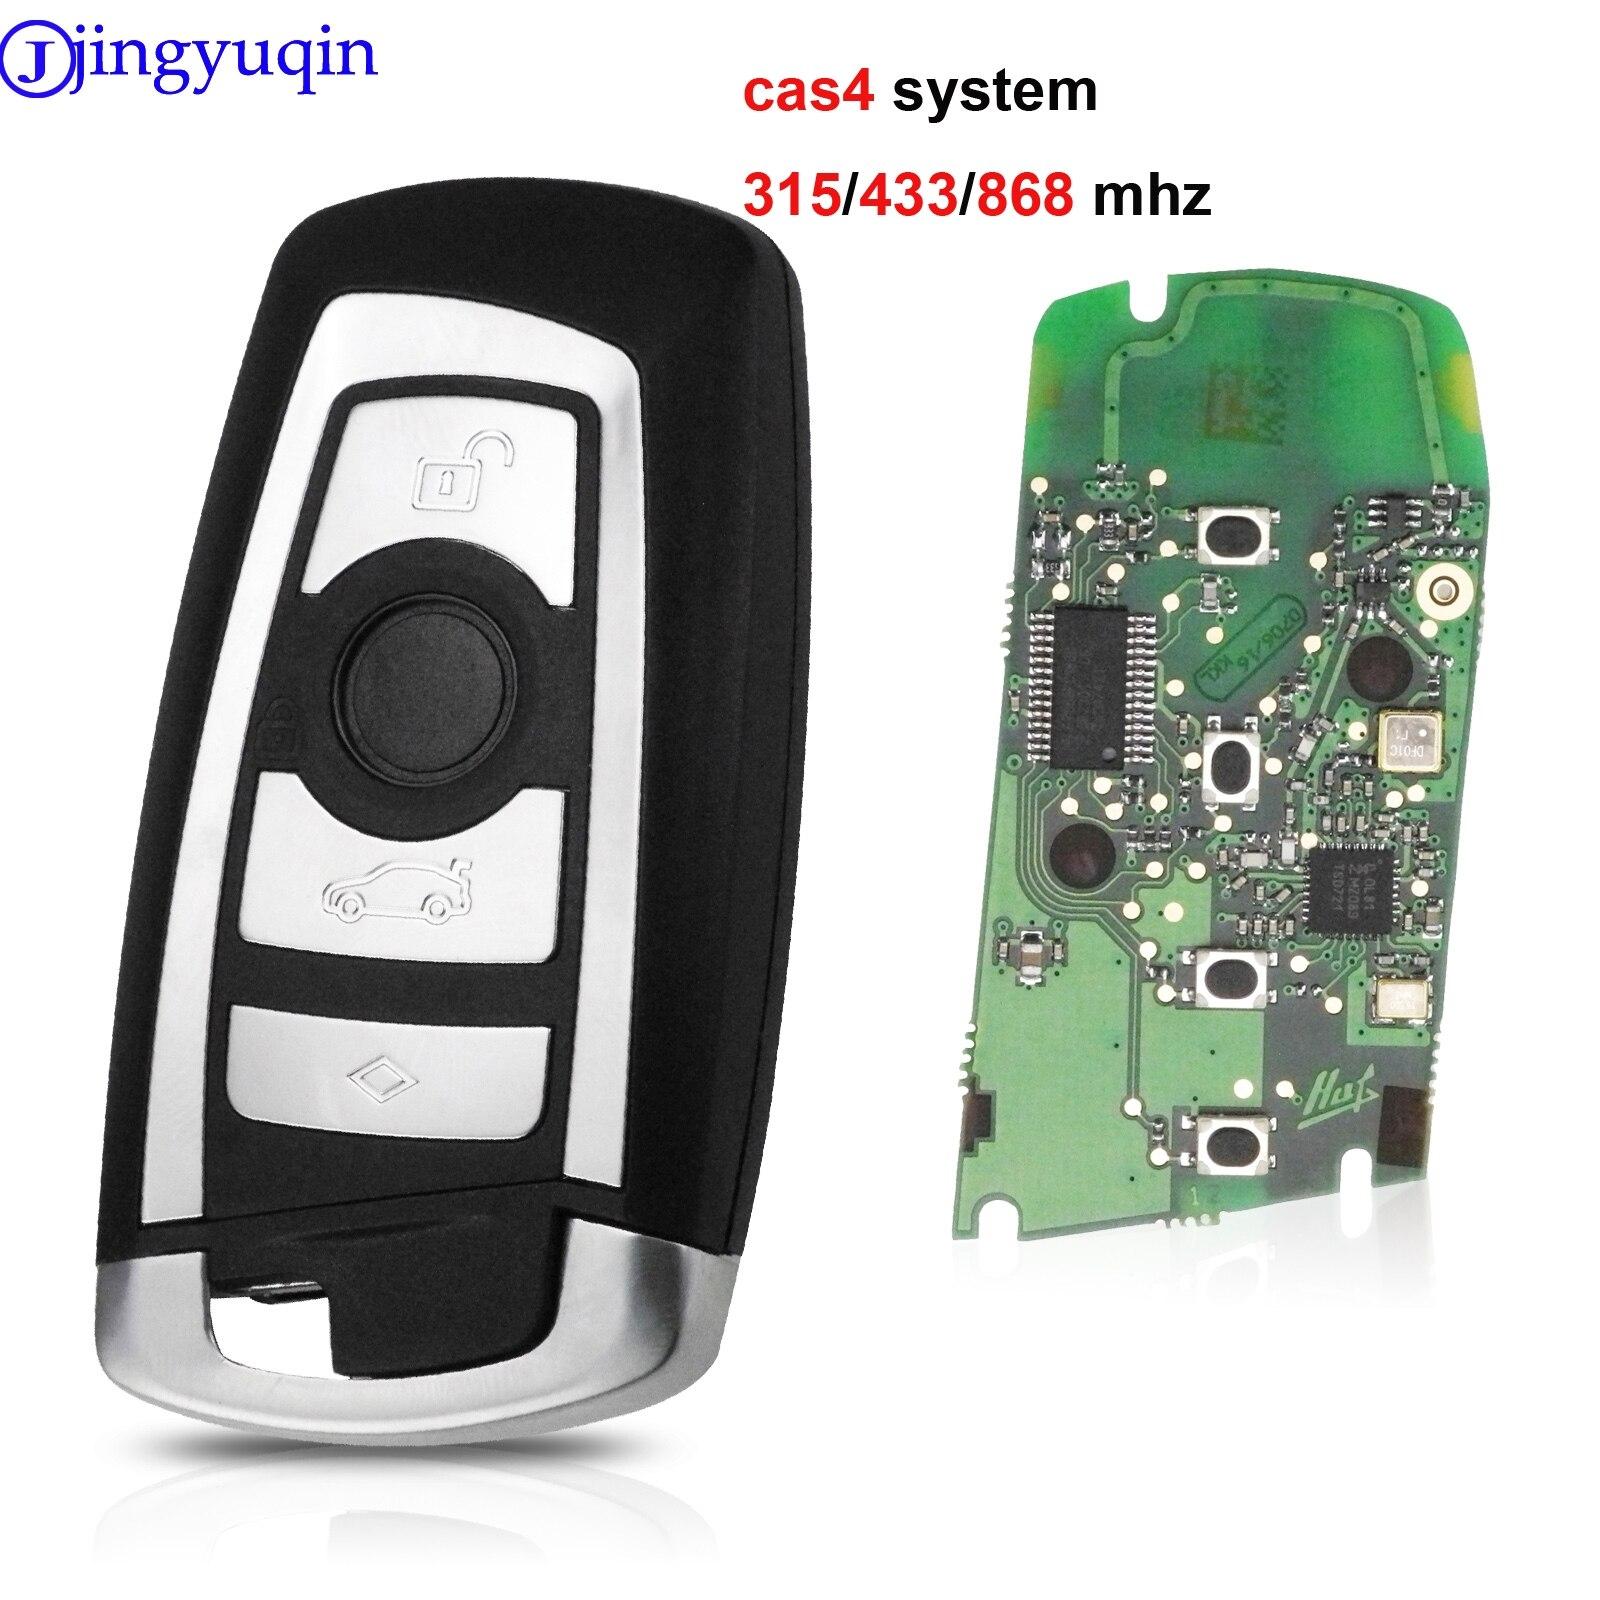 jingyuqin CAS4 868/315/433mhz Car Remote Smart Key For BMW 1 3 5 7 Series CAS4 System Auto Vehichle Alarm Keyless Fob|Car Key| |  - title=